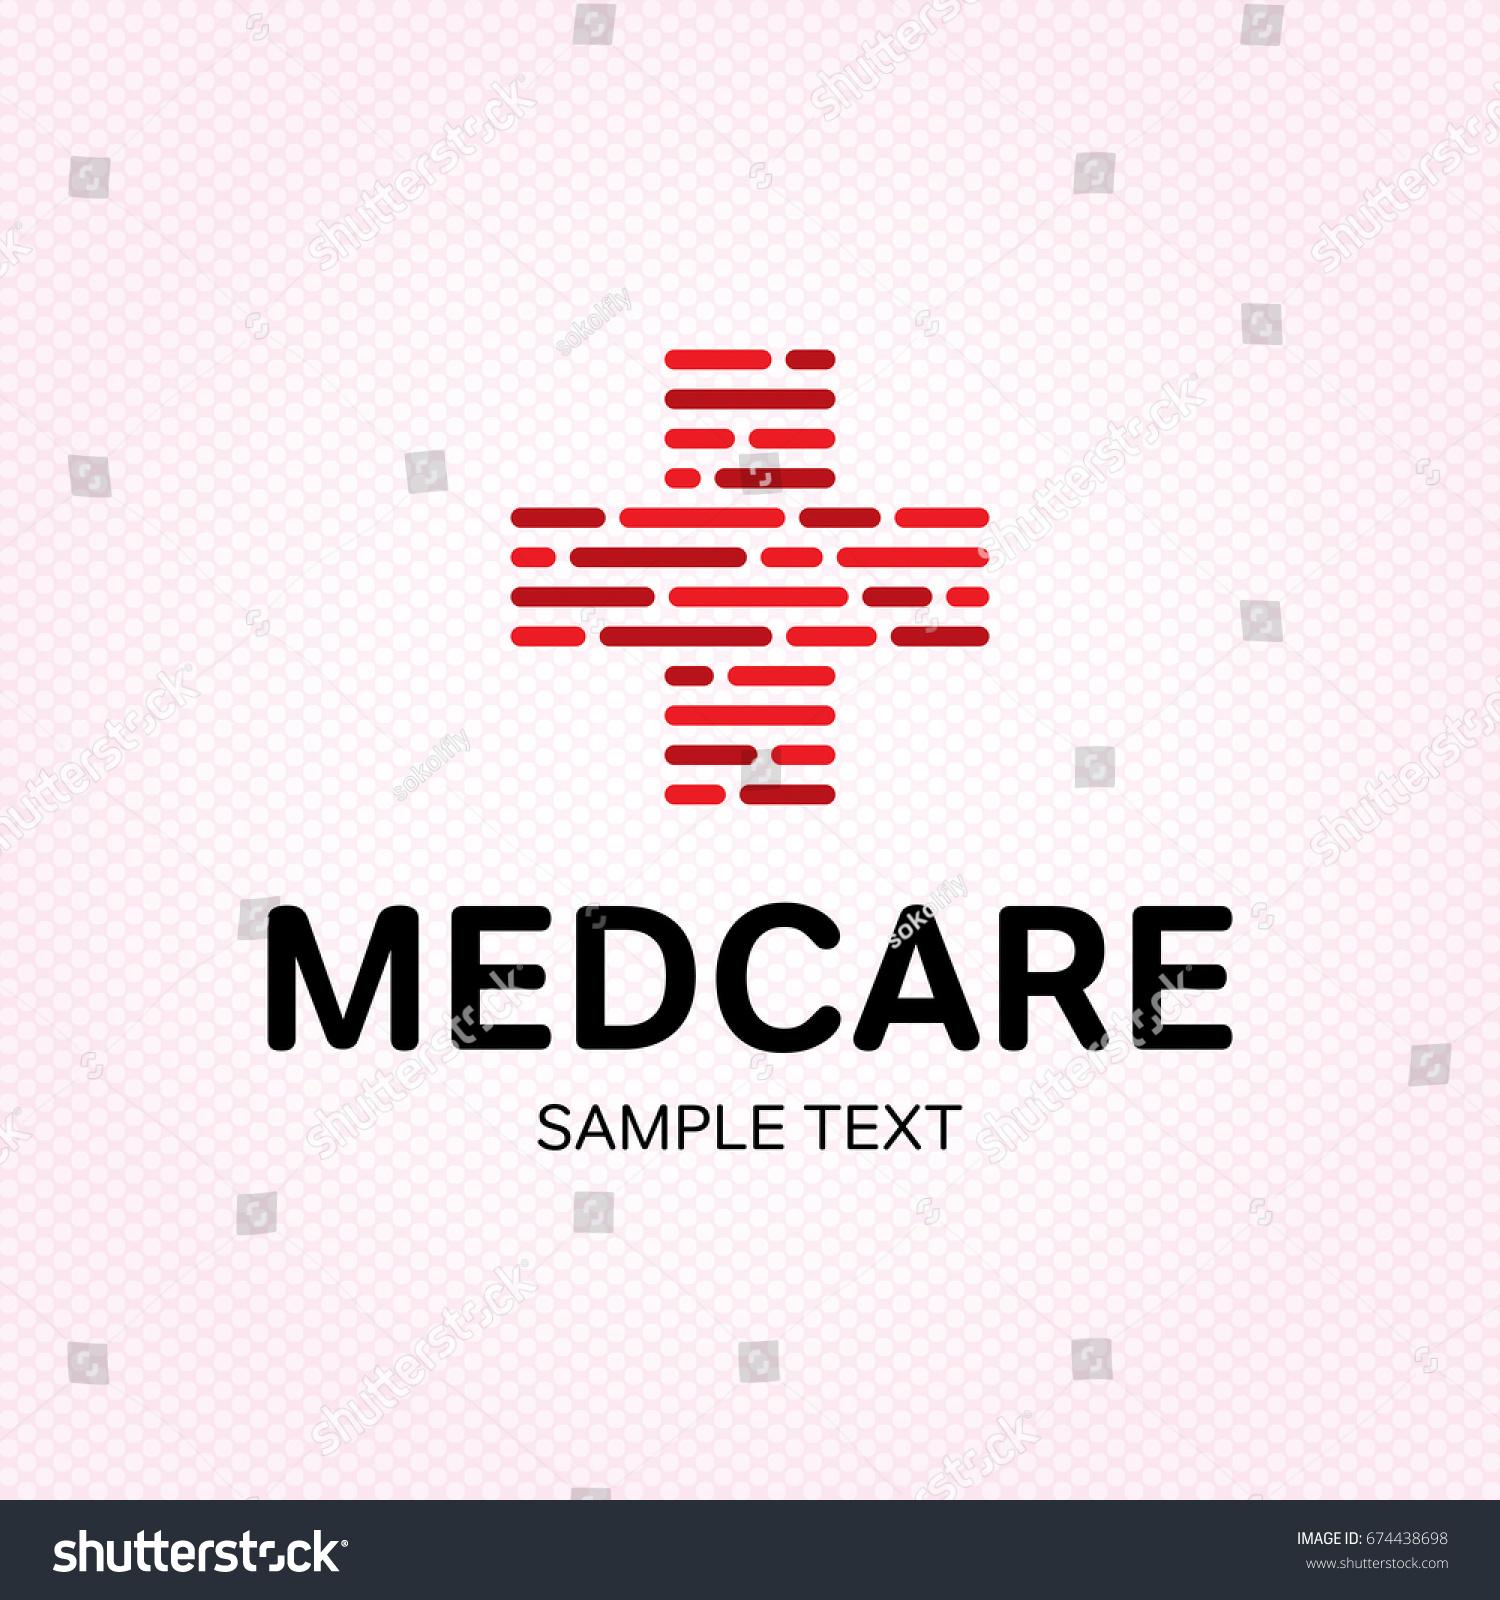 Medical Care Logo Design Template Vector Plus Label Symbol For Hospital Pharmacy Ambulance